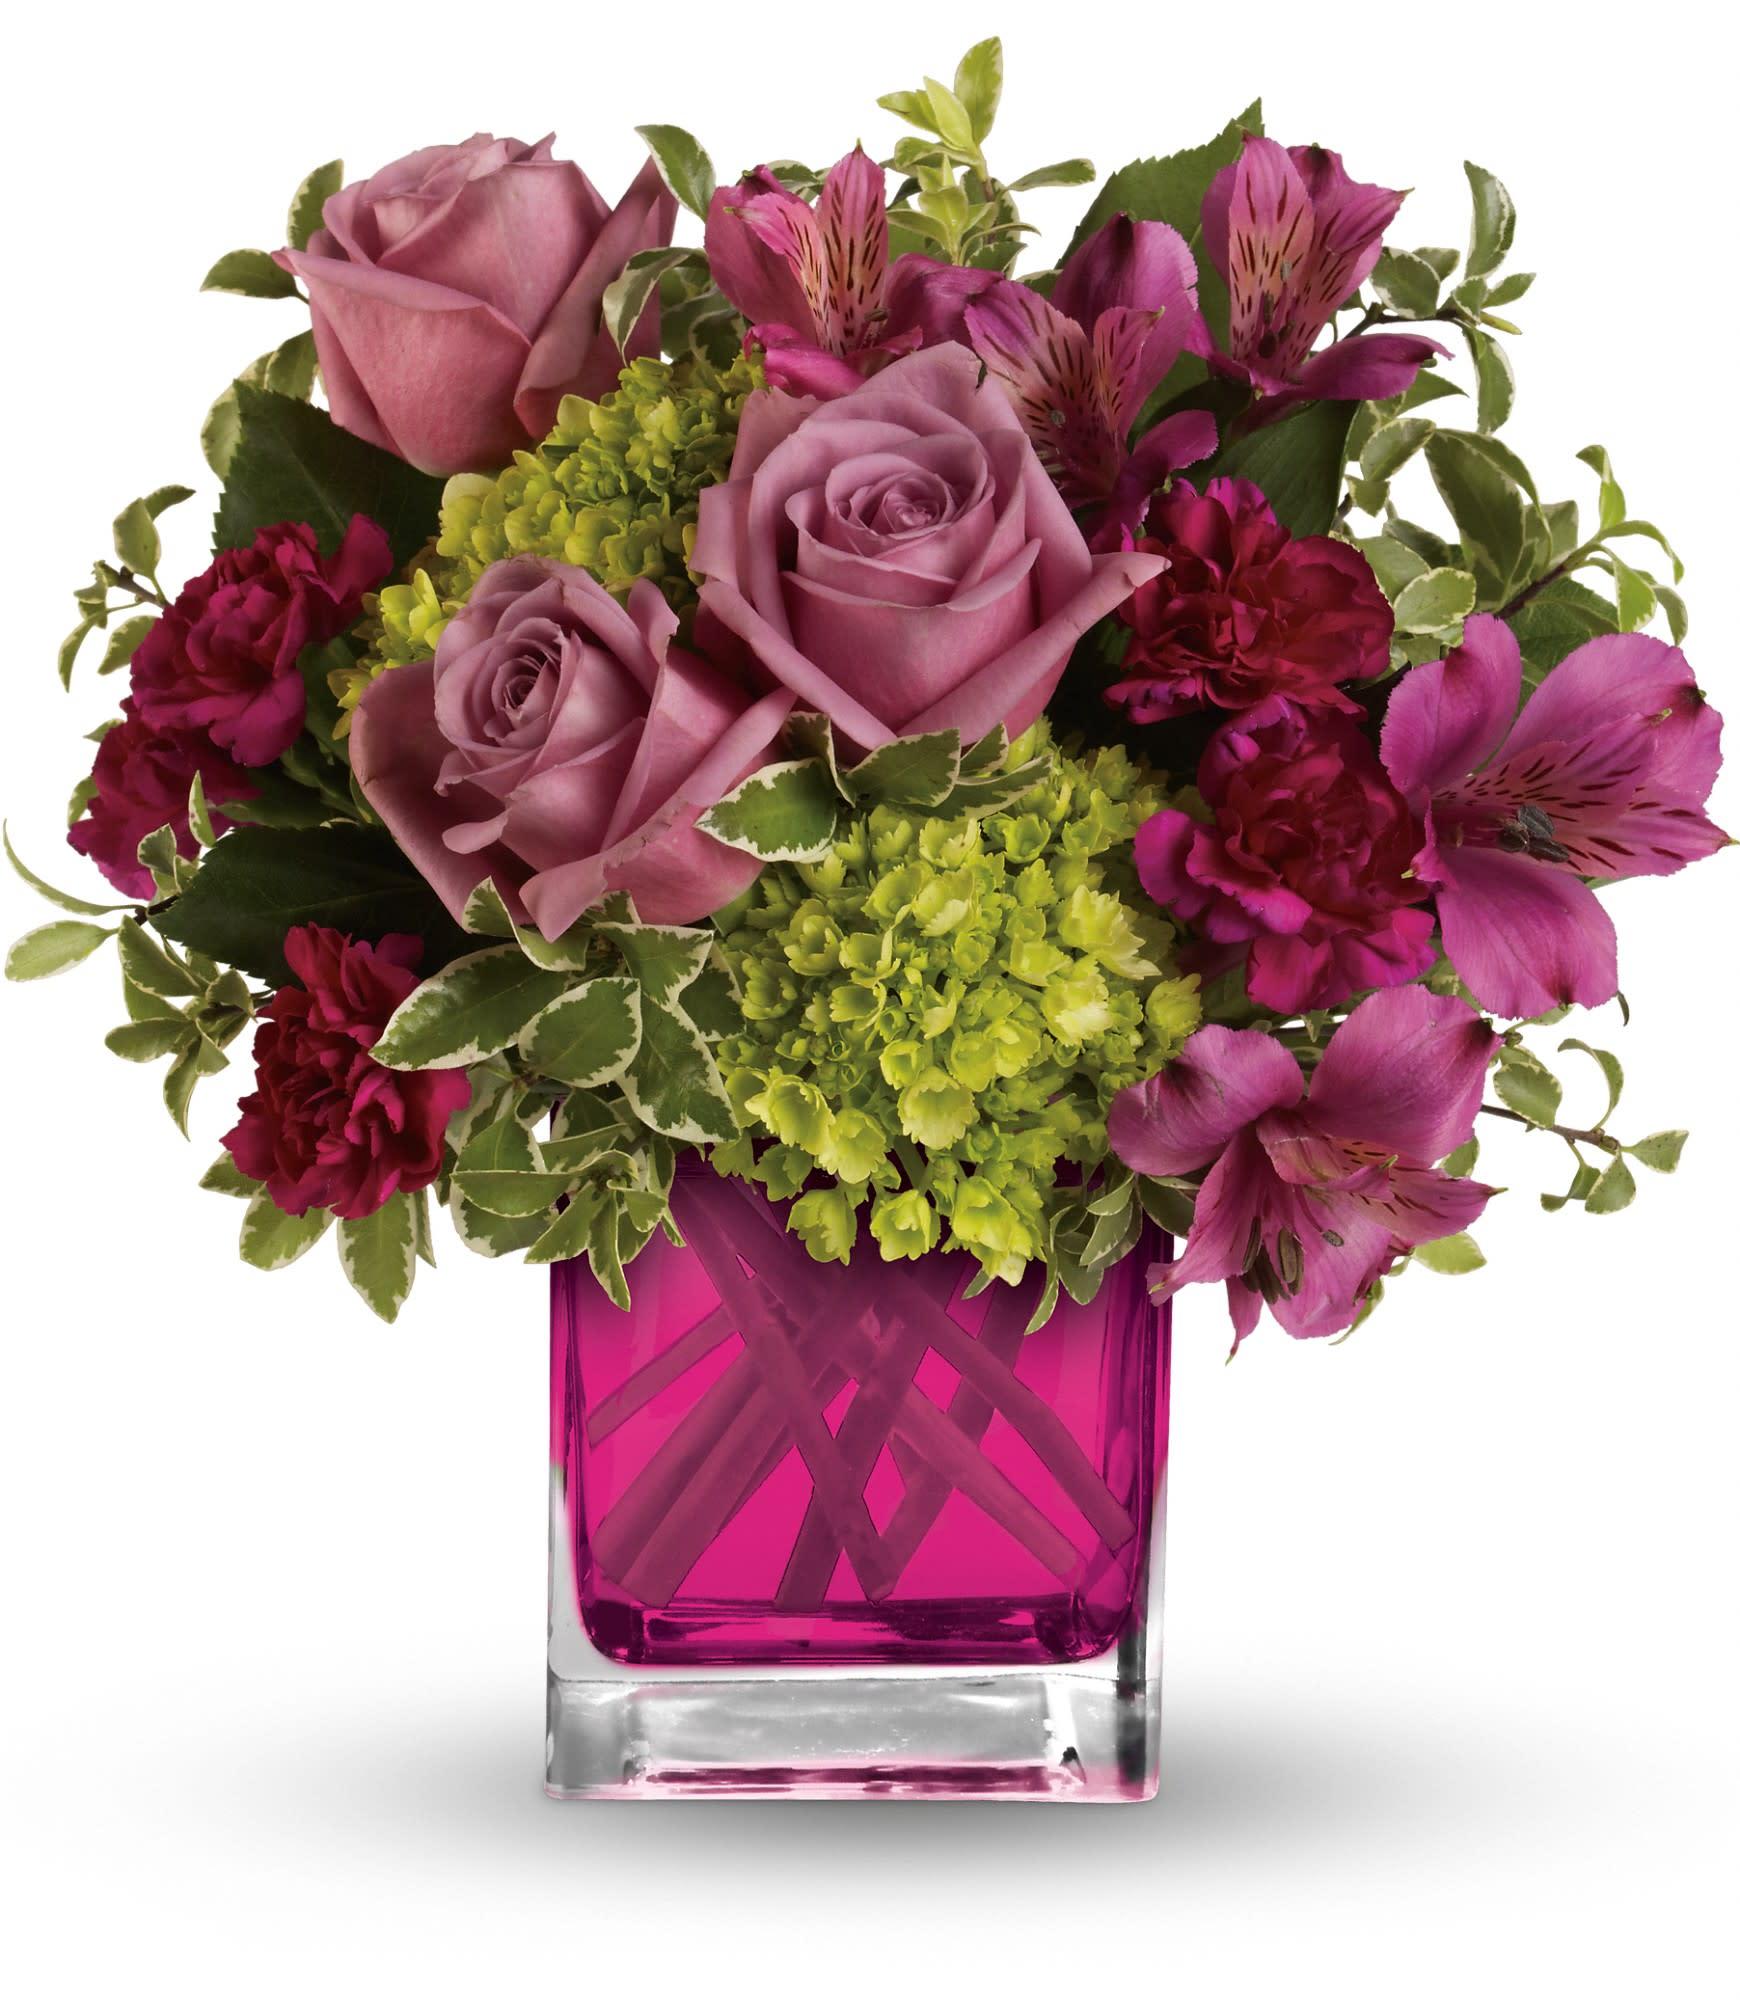 Splendid Surprise By Teleflora In Arlington Ma Cody Floral Designs